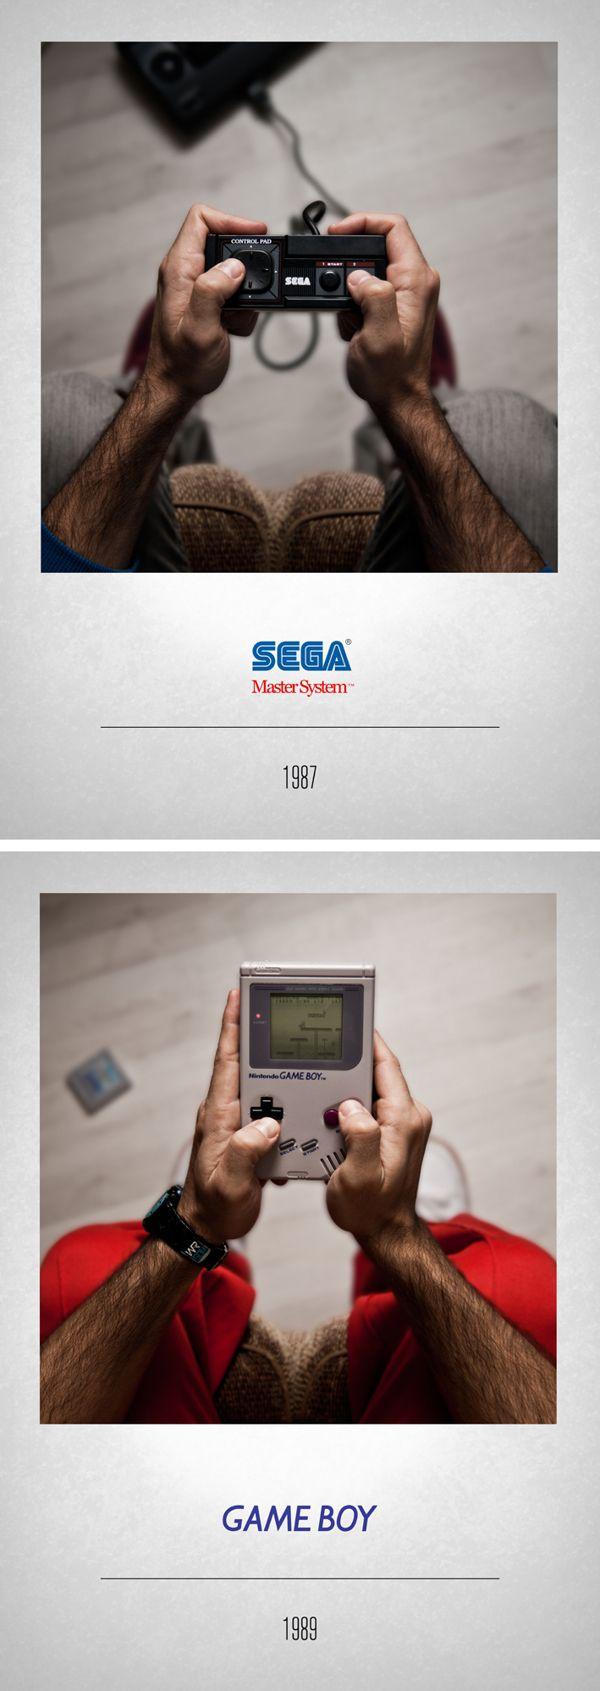 Sega Master system / Nintendo Gameboy